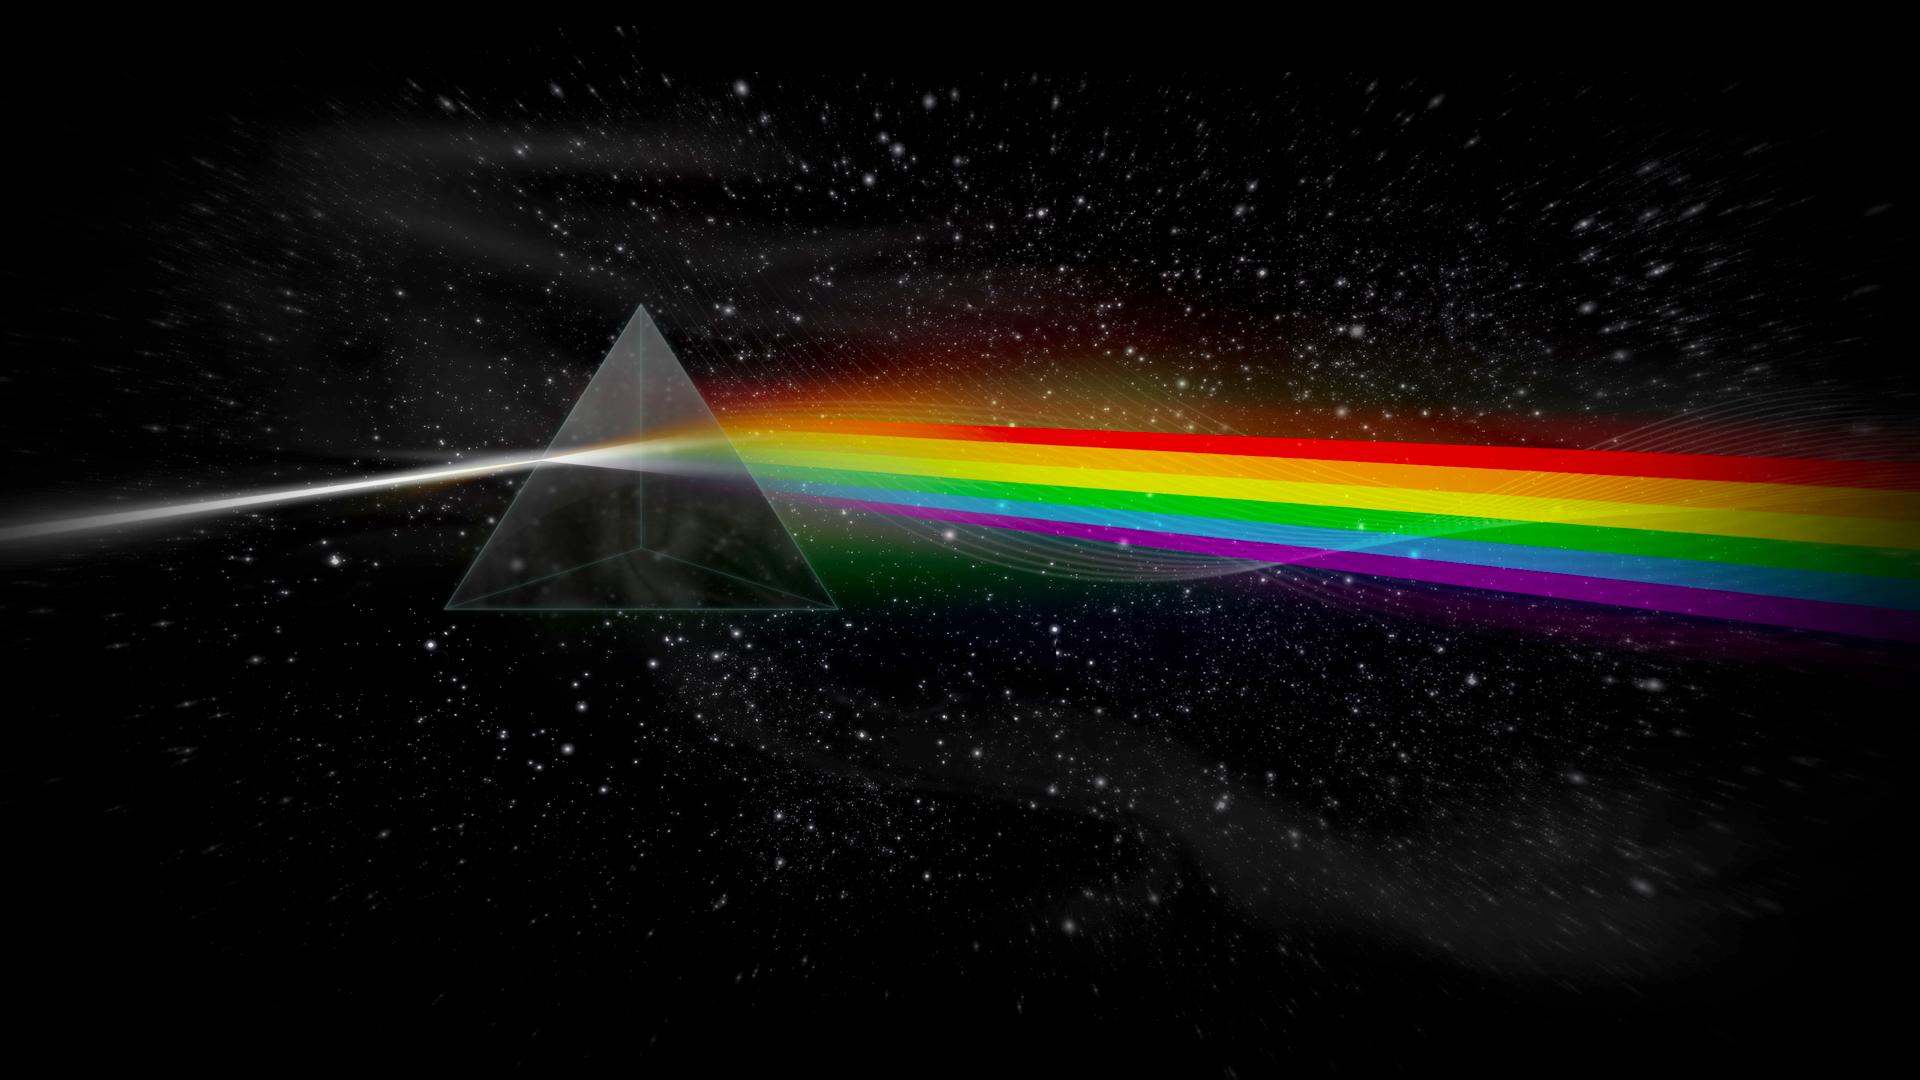 Download Pink Floyd Wallpaper 1920x1080 Wallpoper 283465 1920x1080